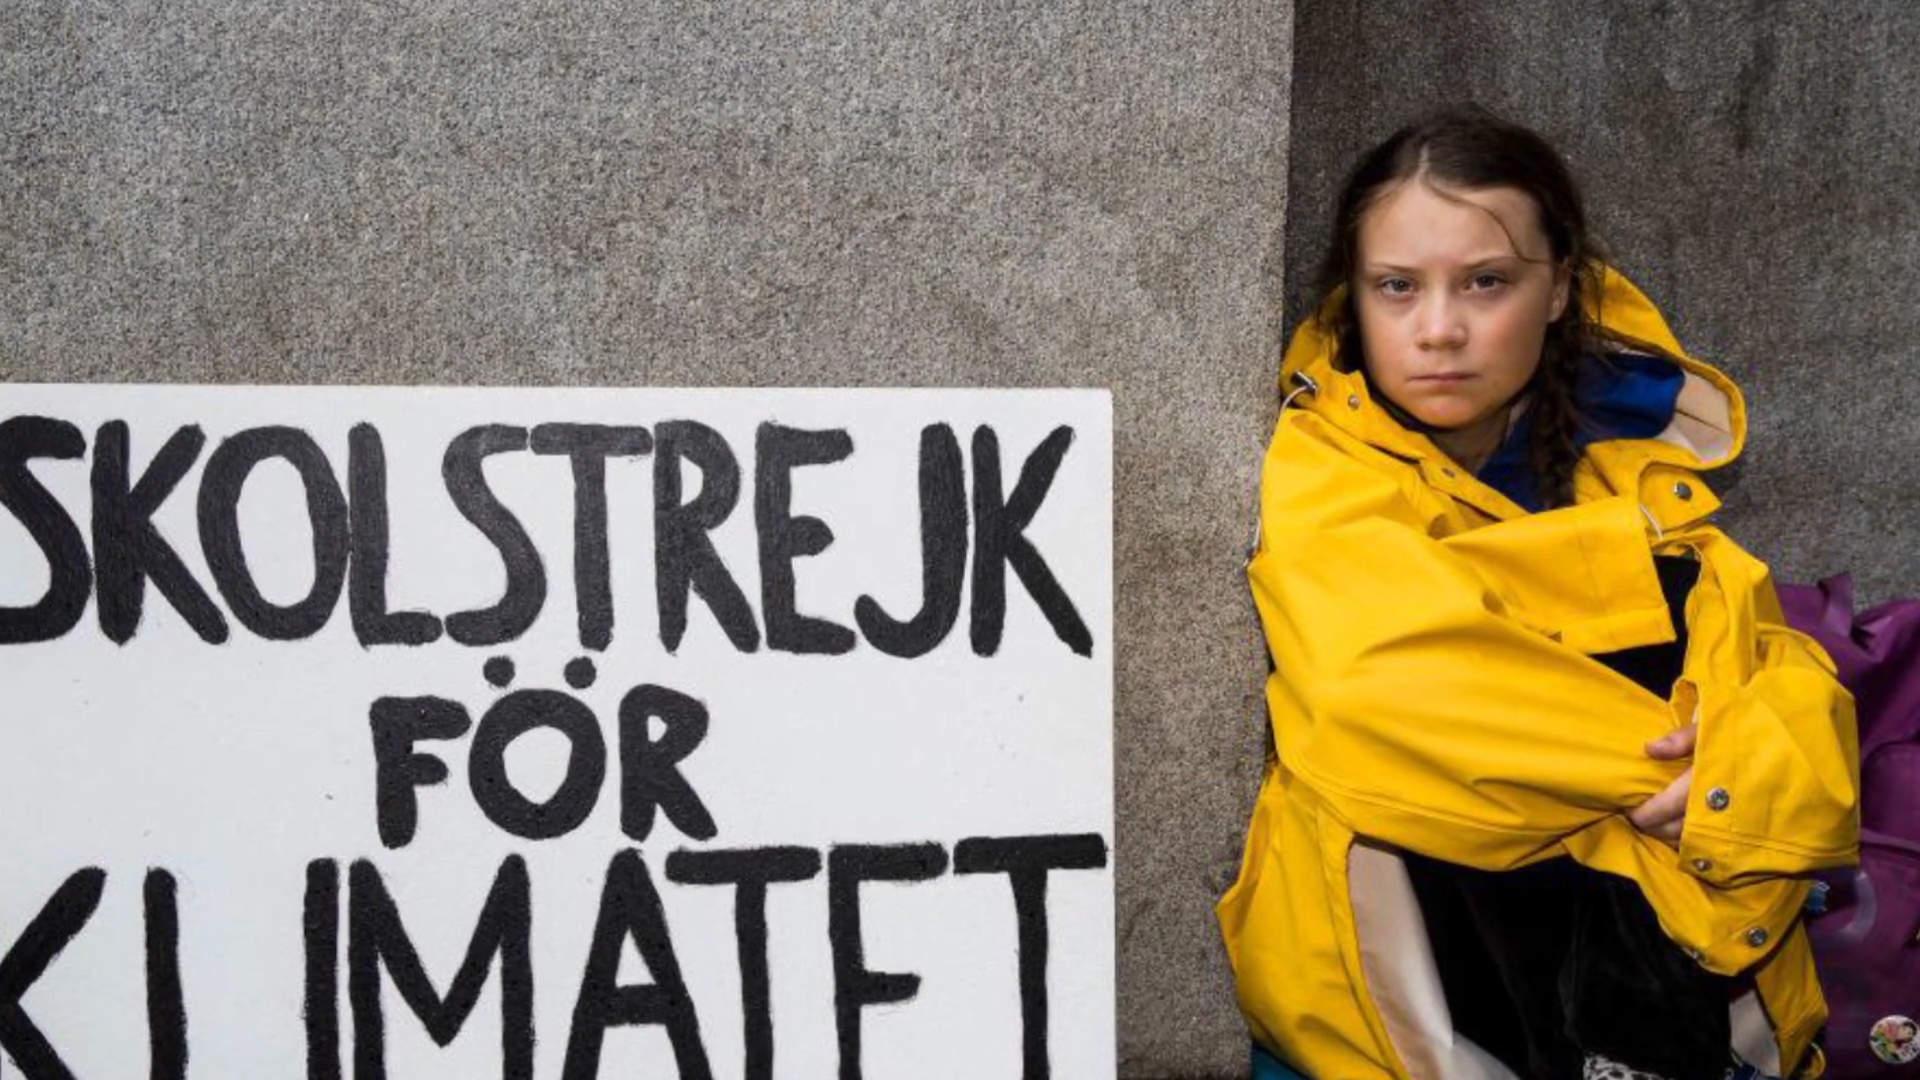 Hulu producing documentary on Greta Thunberg